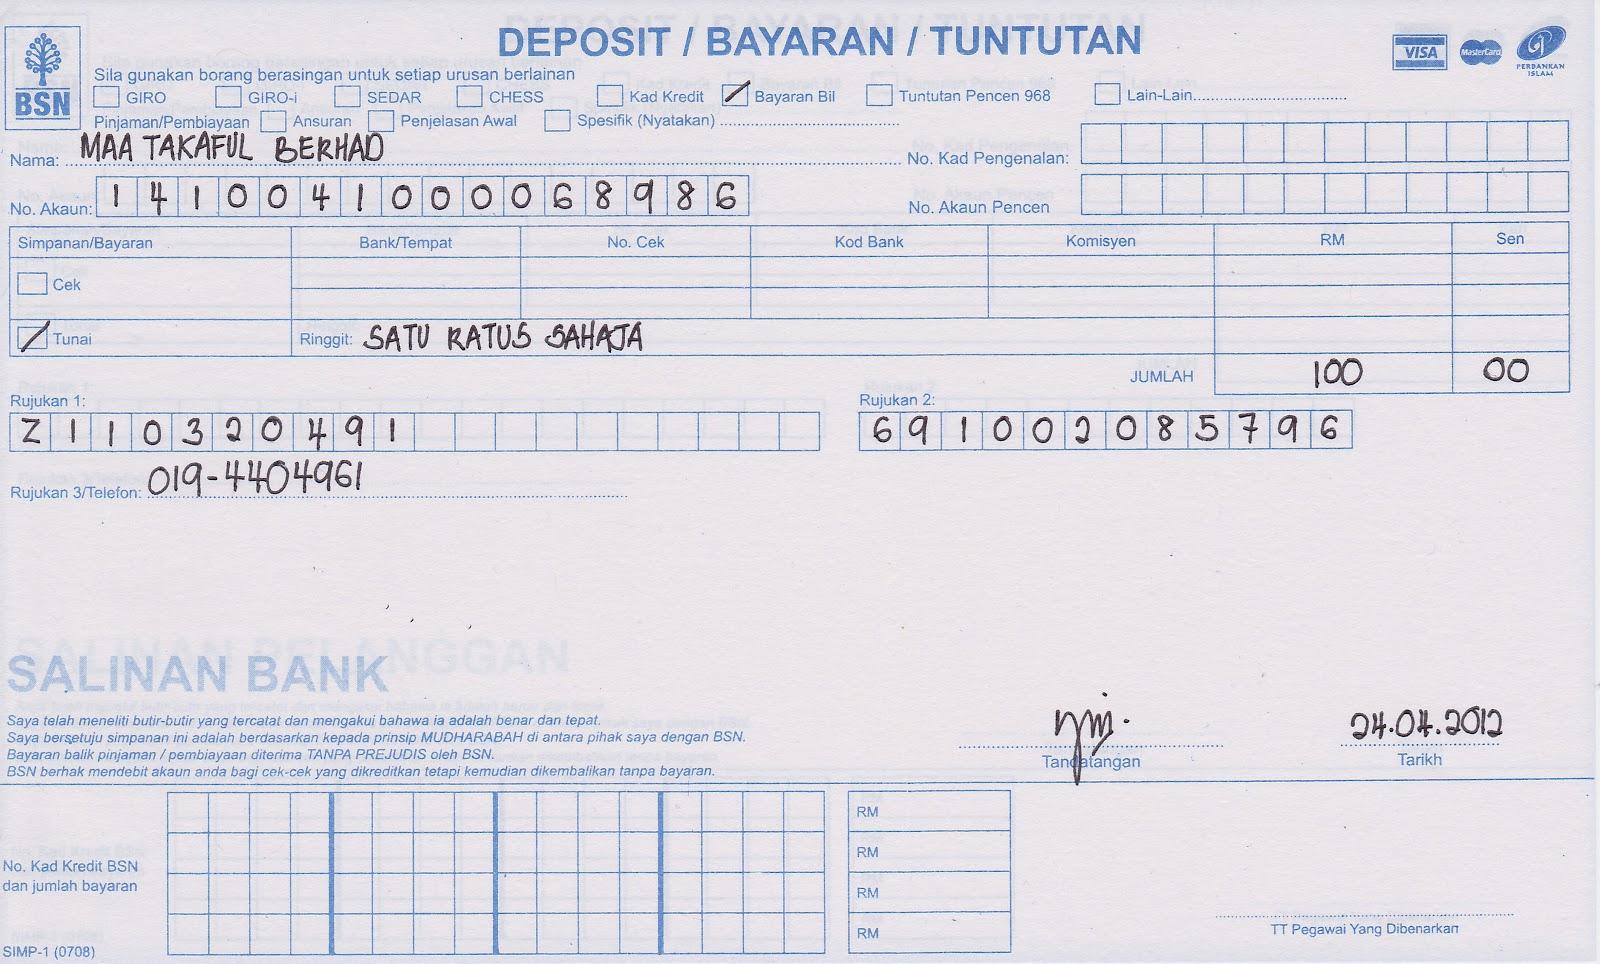 Maa Takaful Berhad Agensi Ikhwan Bank Simpanan Nasional Over The Counter Method